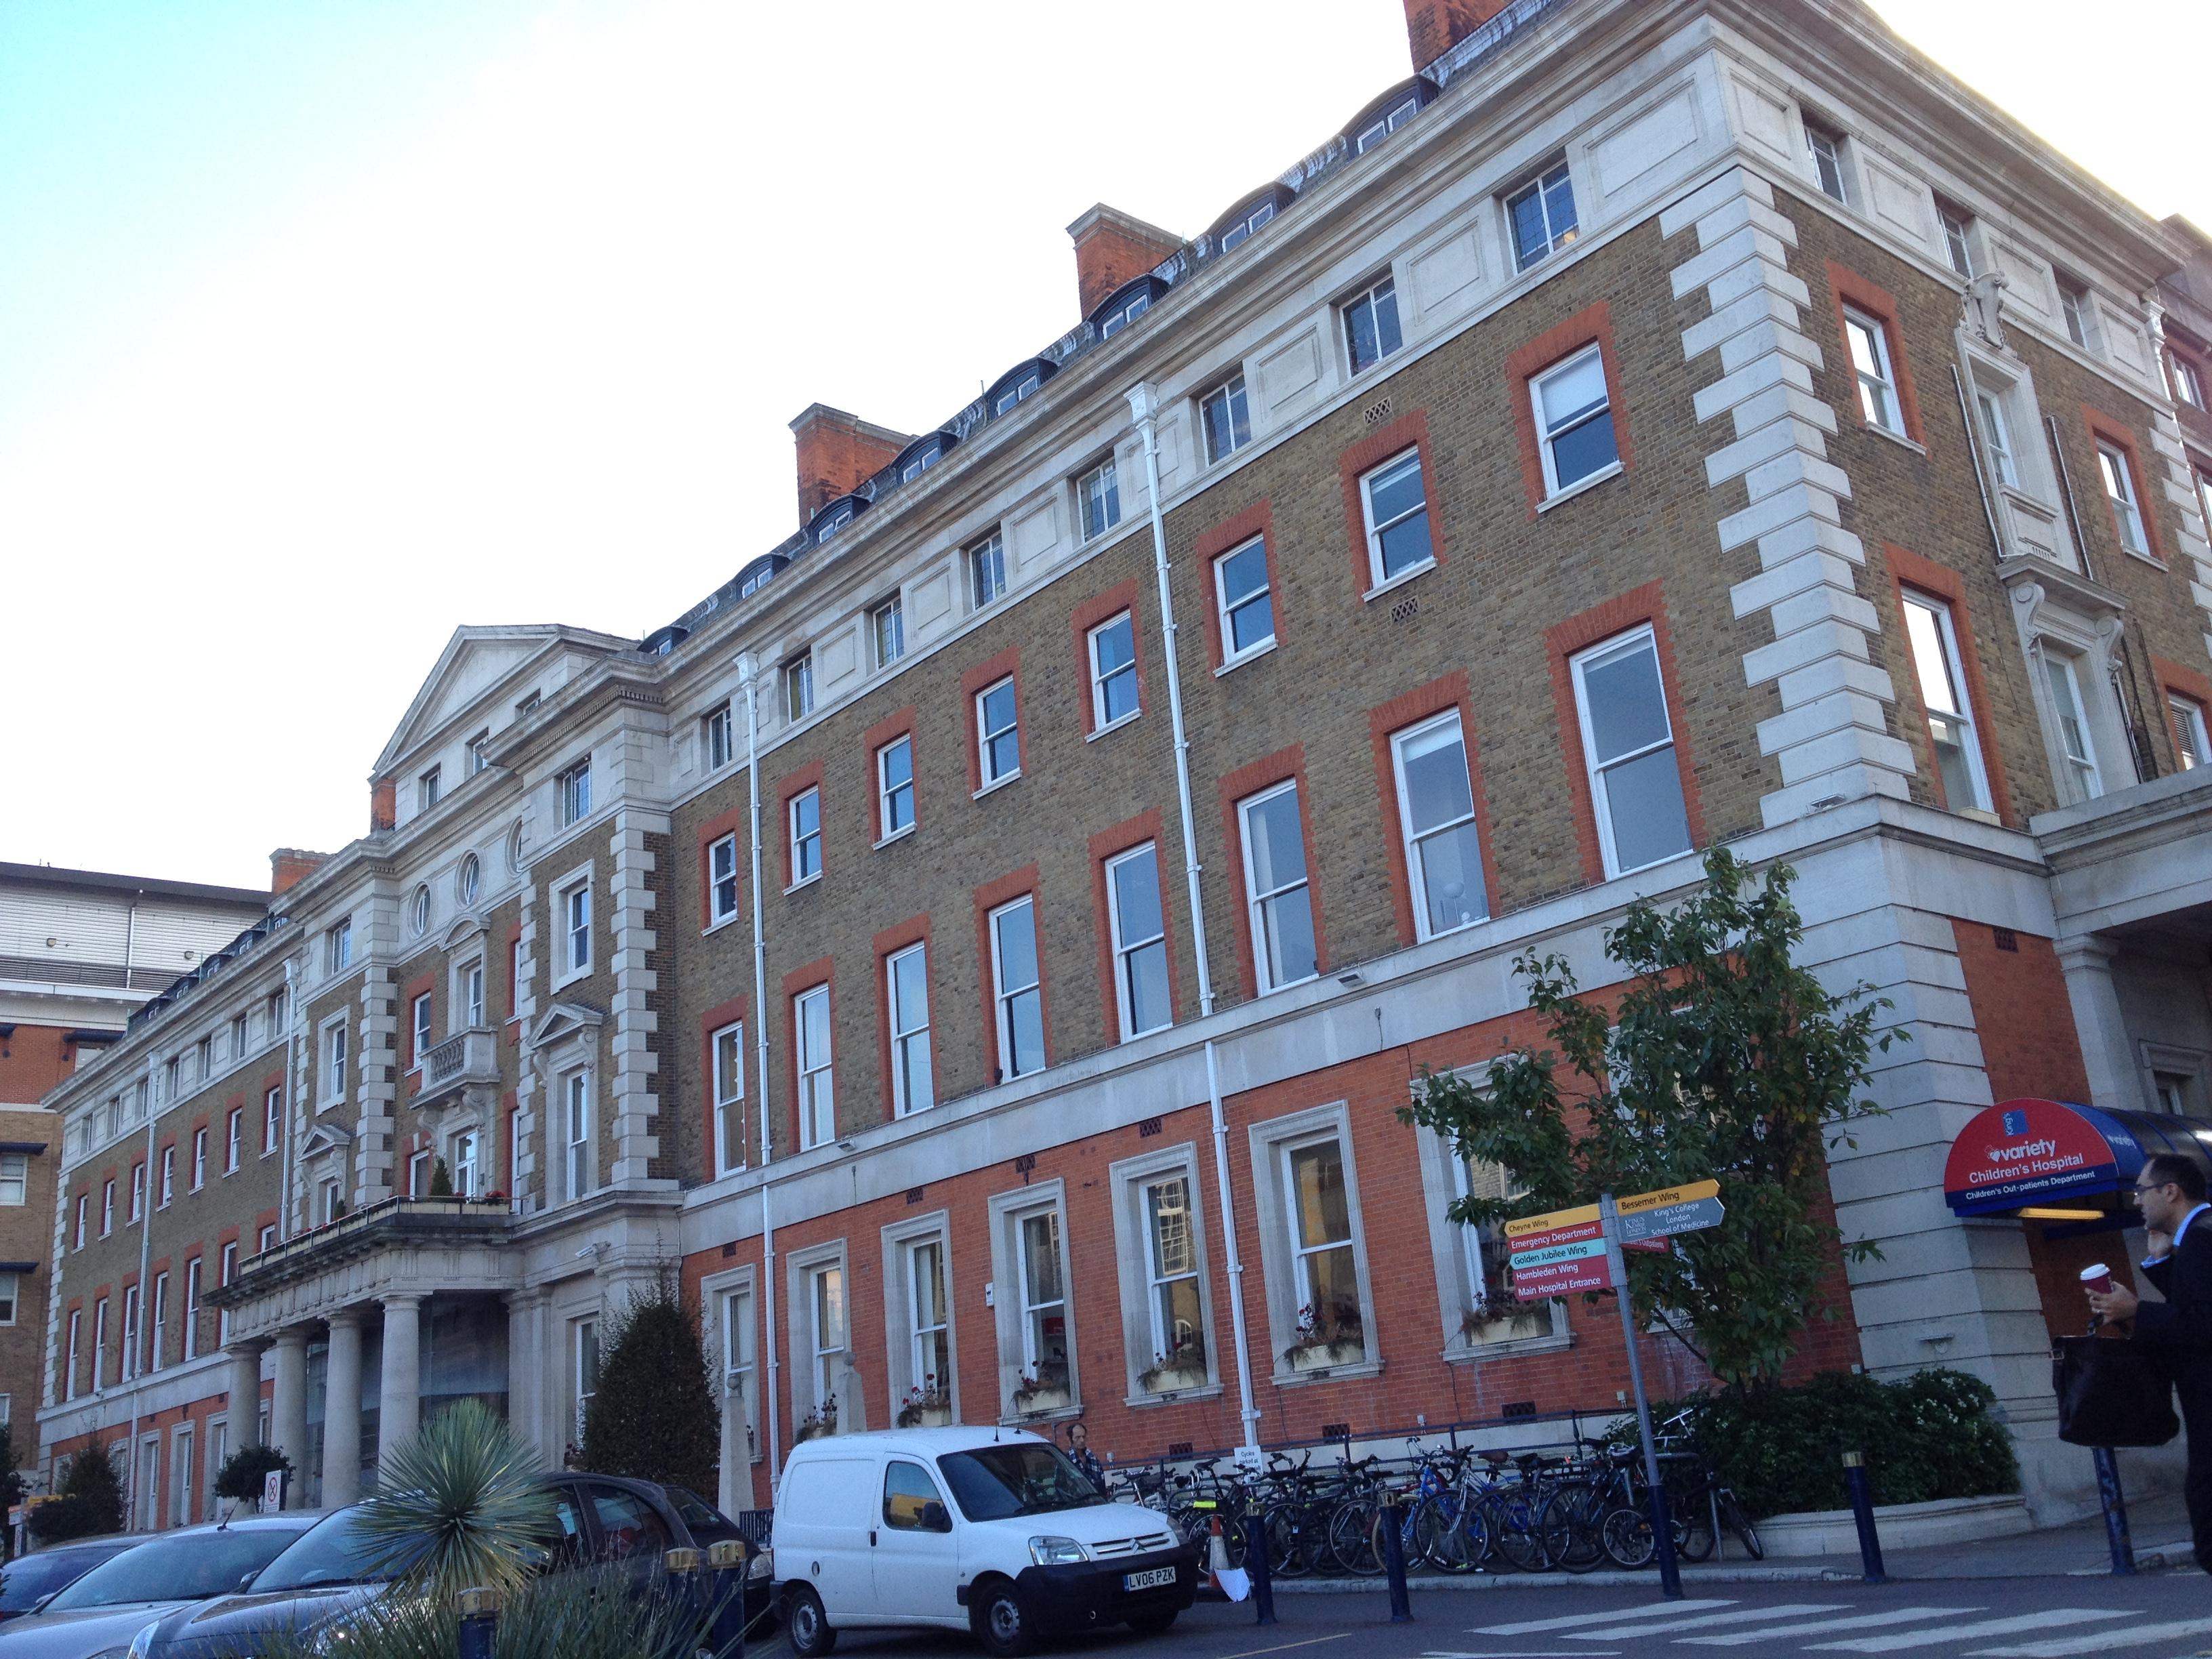 King's College Hospital - Wikipedia